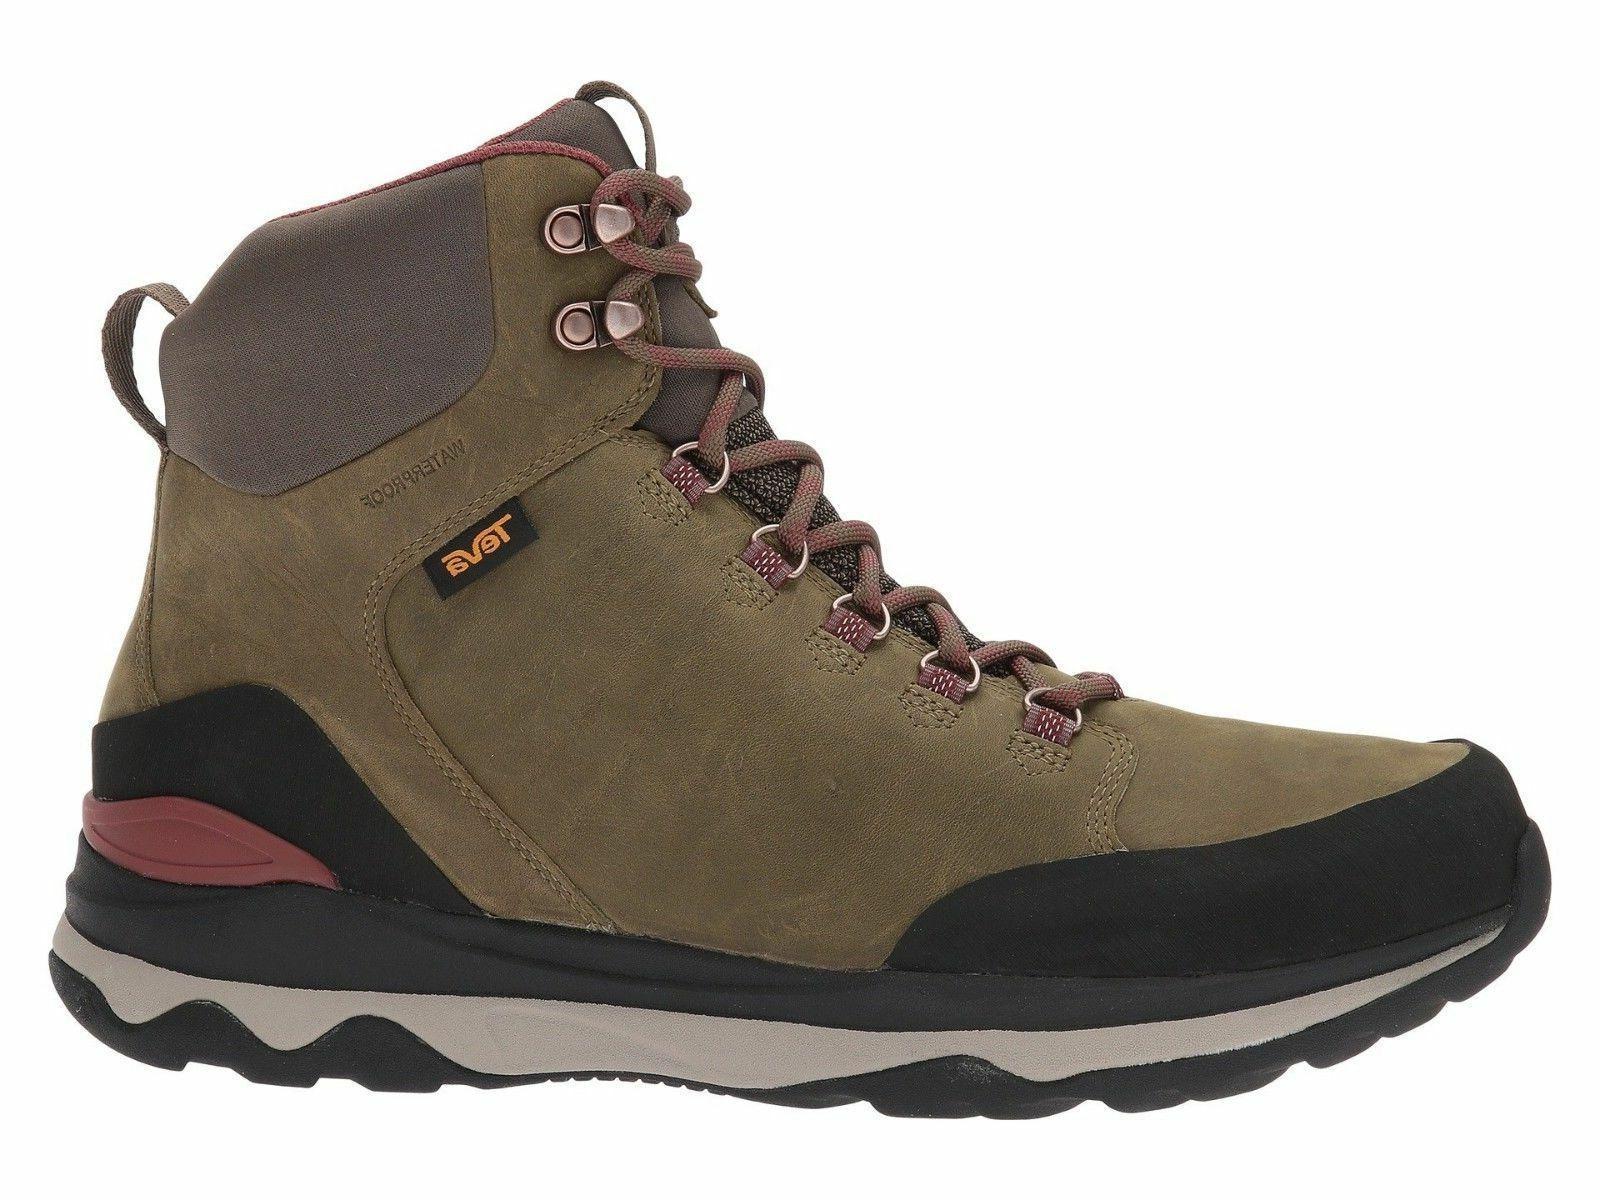 Teva Tall Waterproof men's Hiking Outdoor Snow Boots